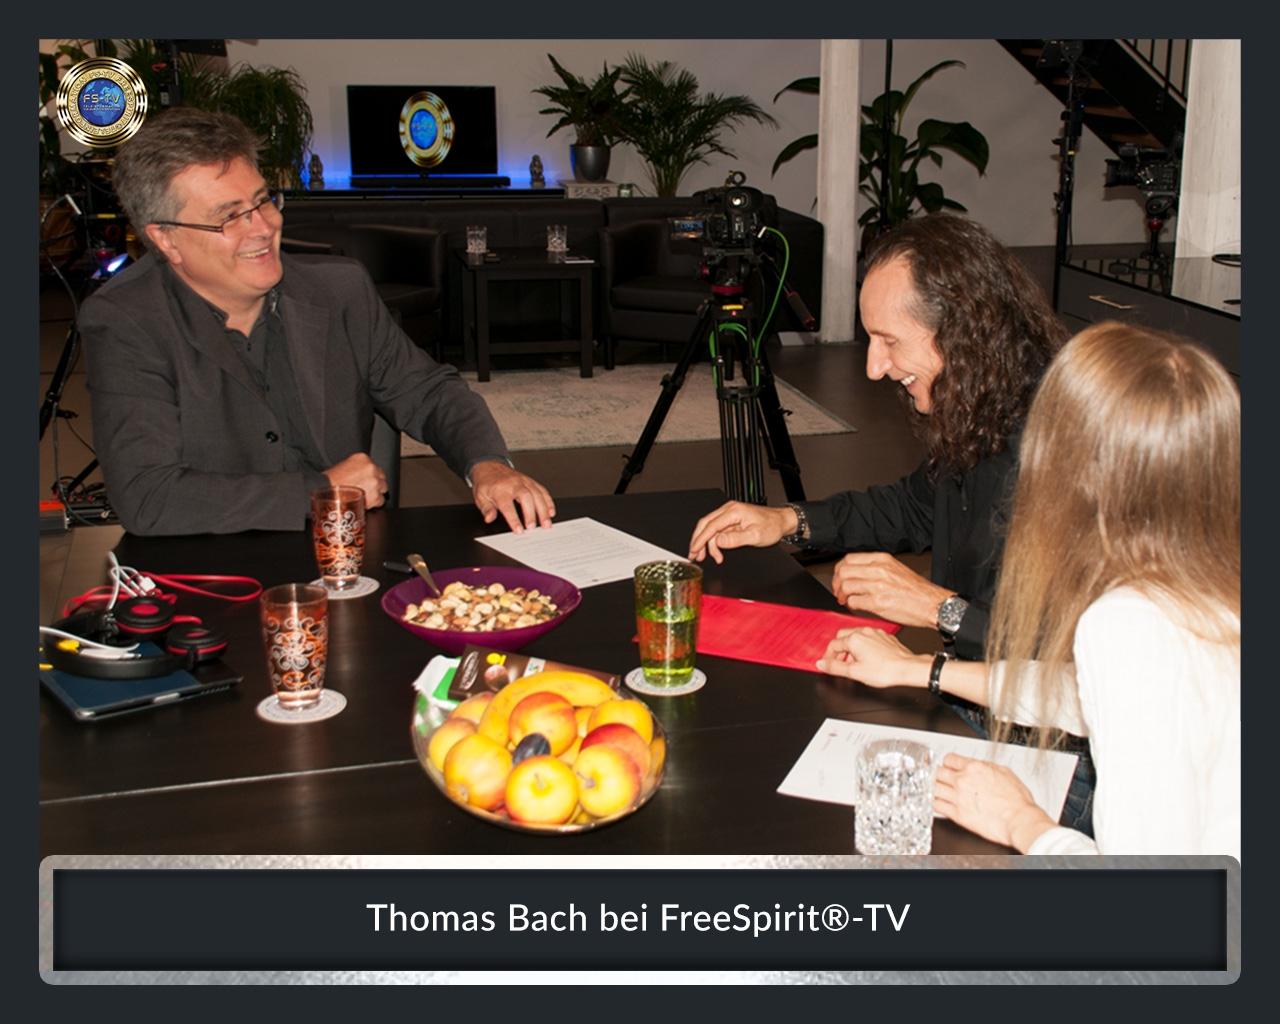 FS-TV-Bildergallerie-Thomas-Bach-1